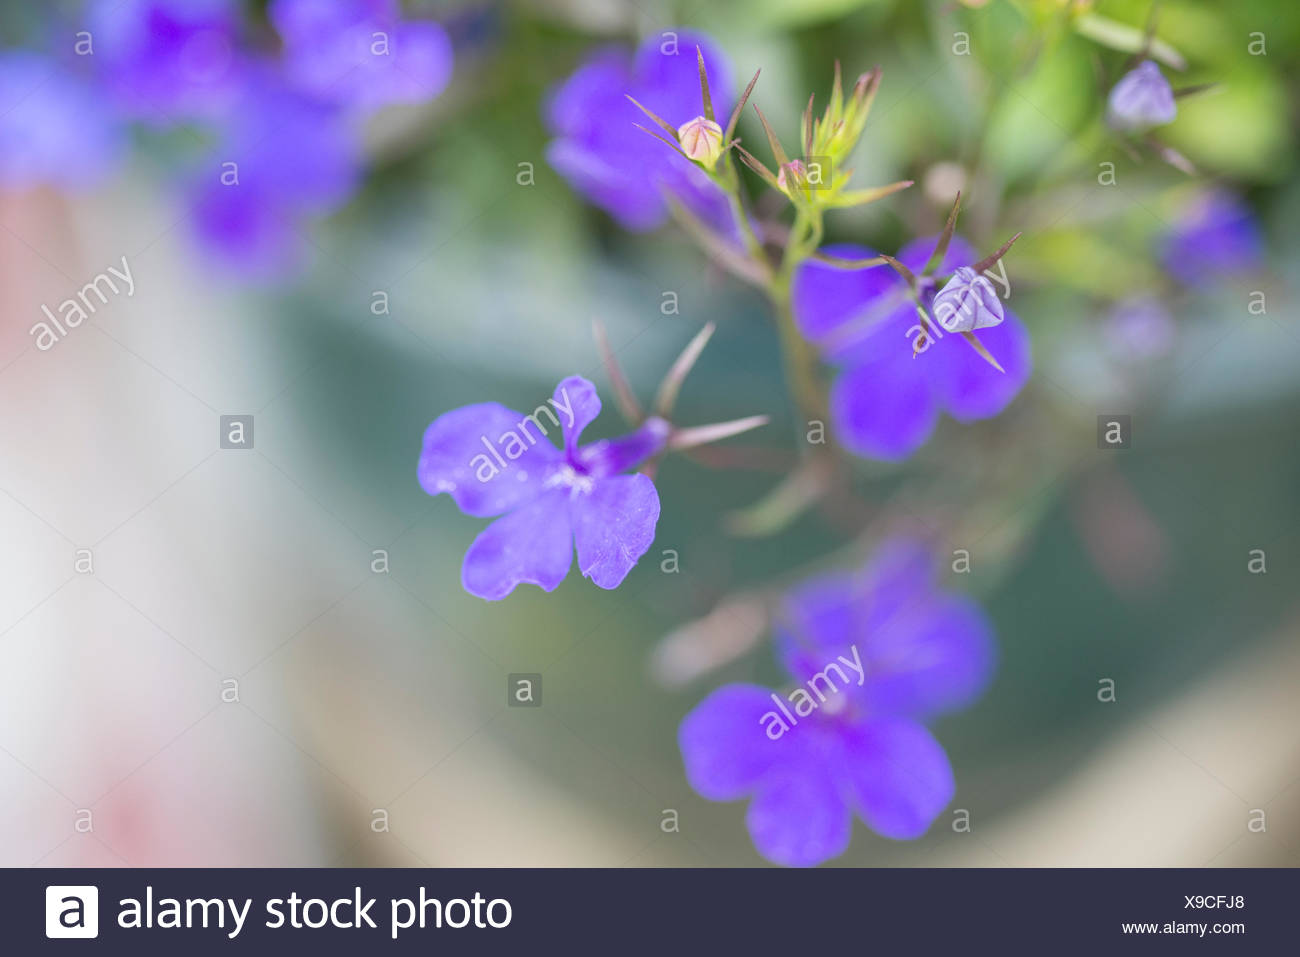 Small Purple Flowers Stock Photo 281173488 Alamy